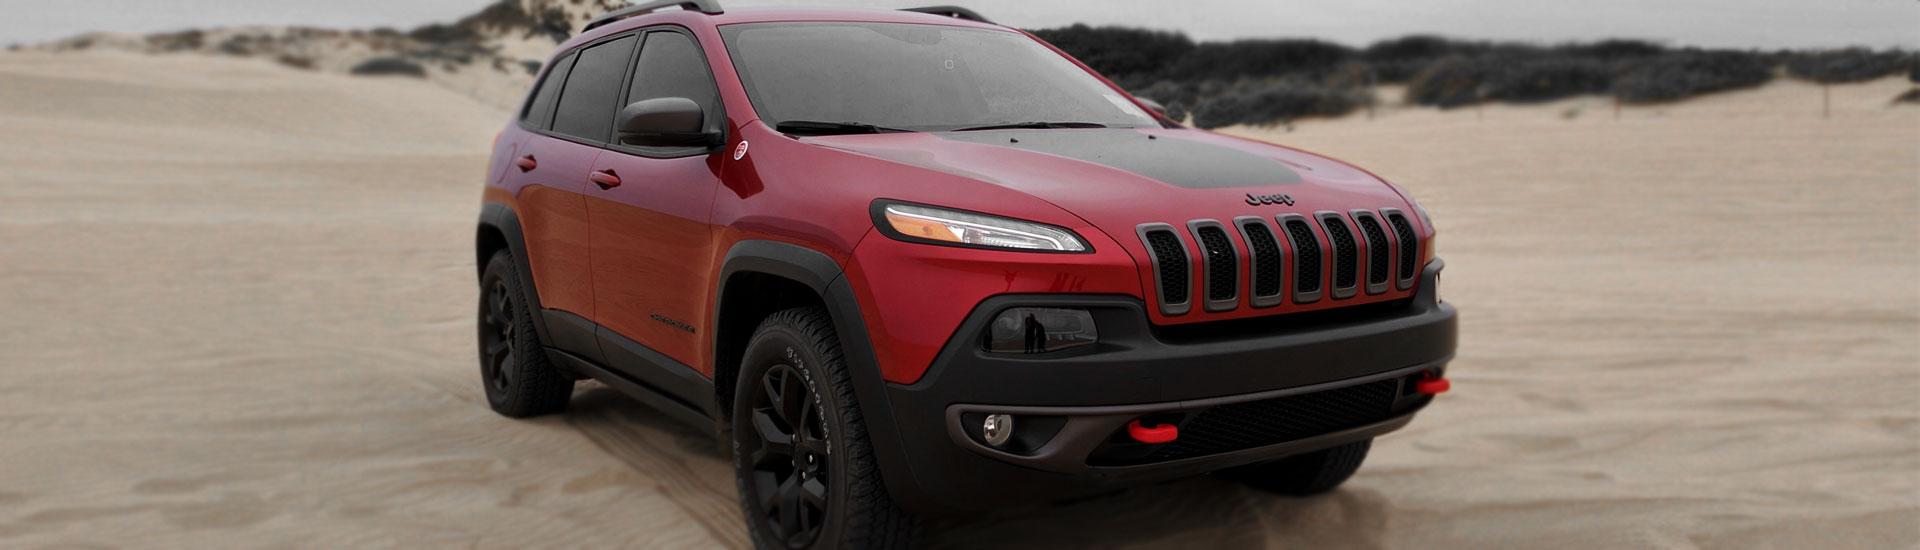 hight resolution of jeep cherokee window tint